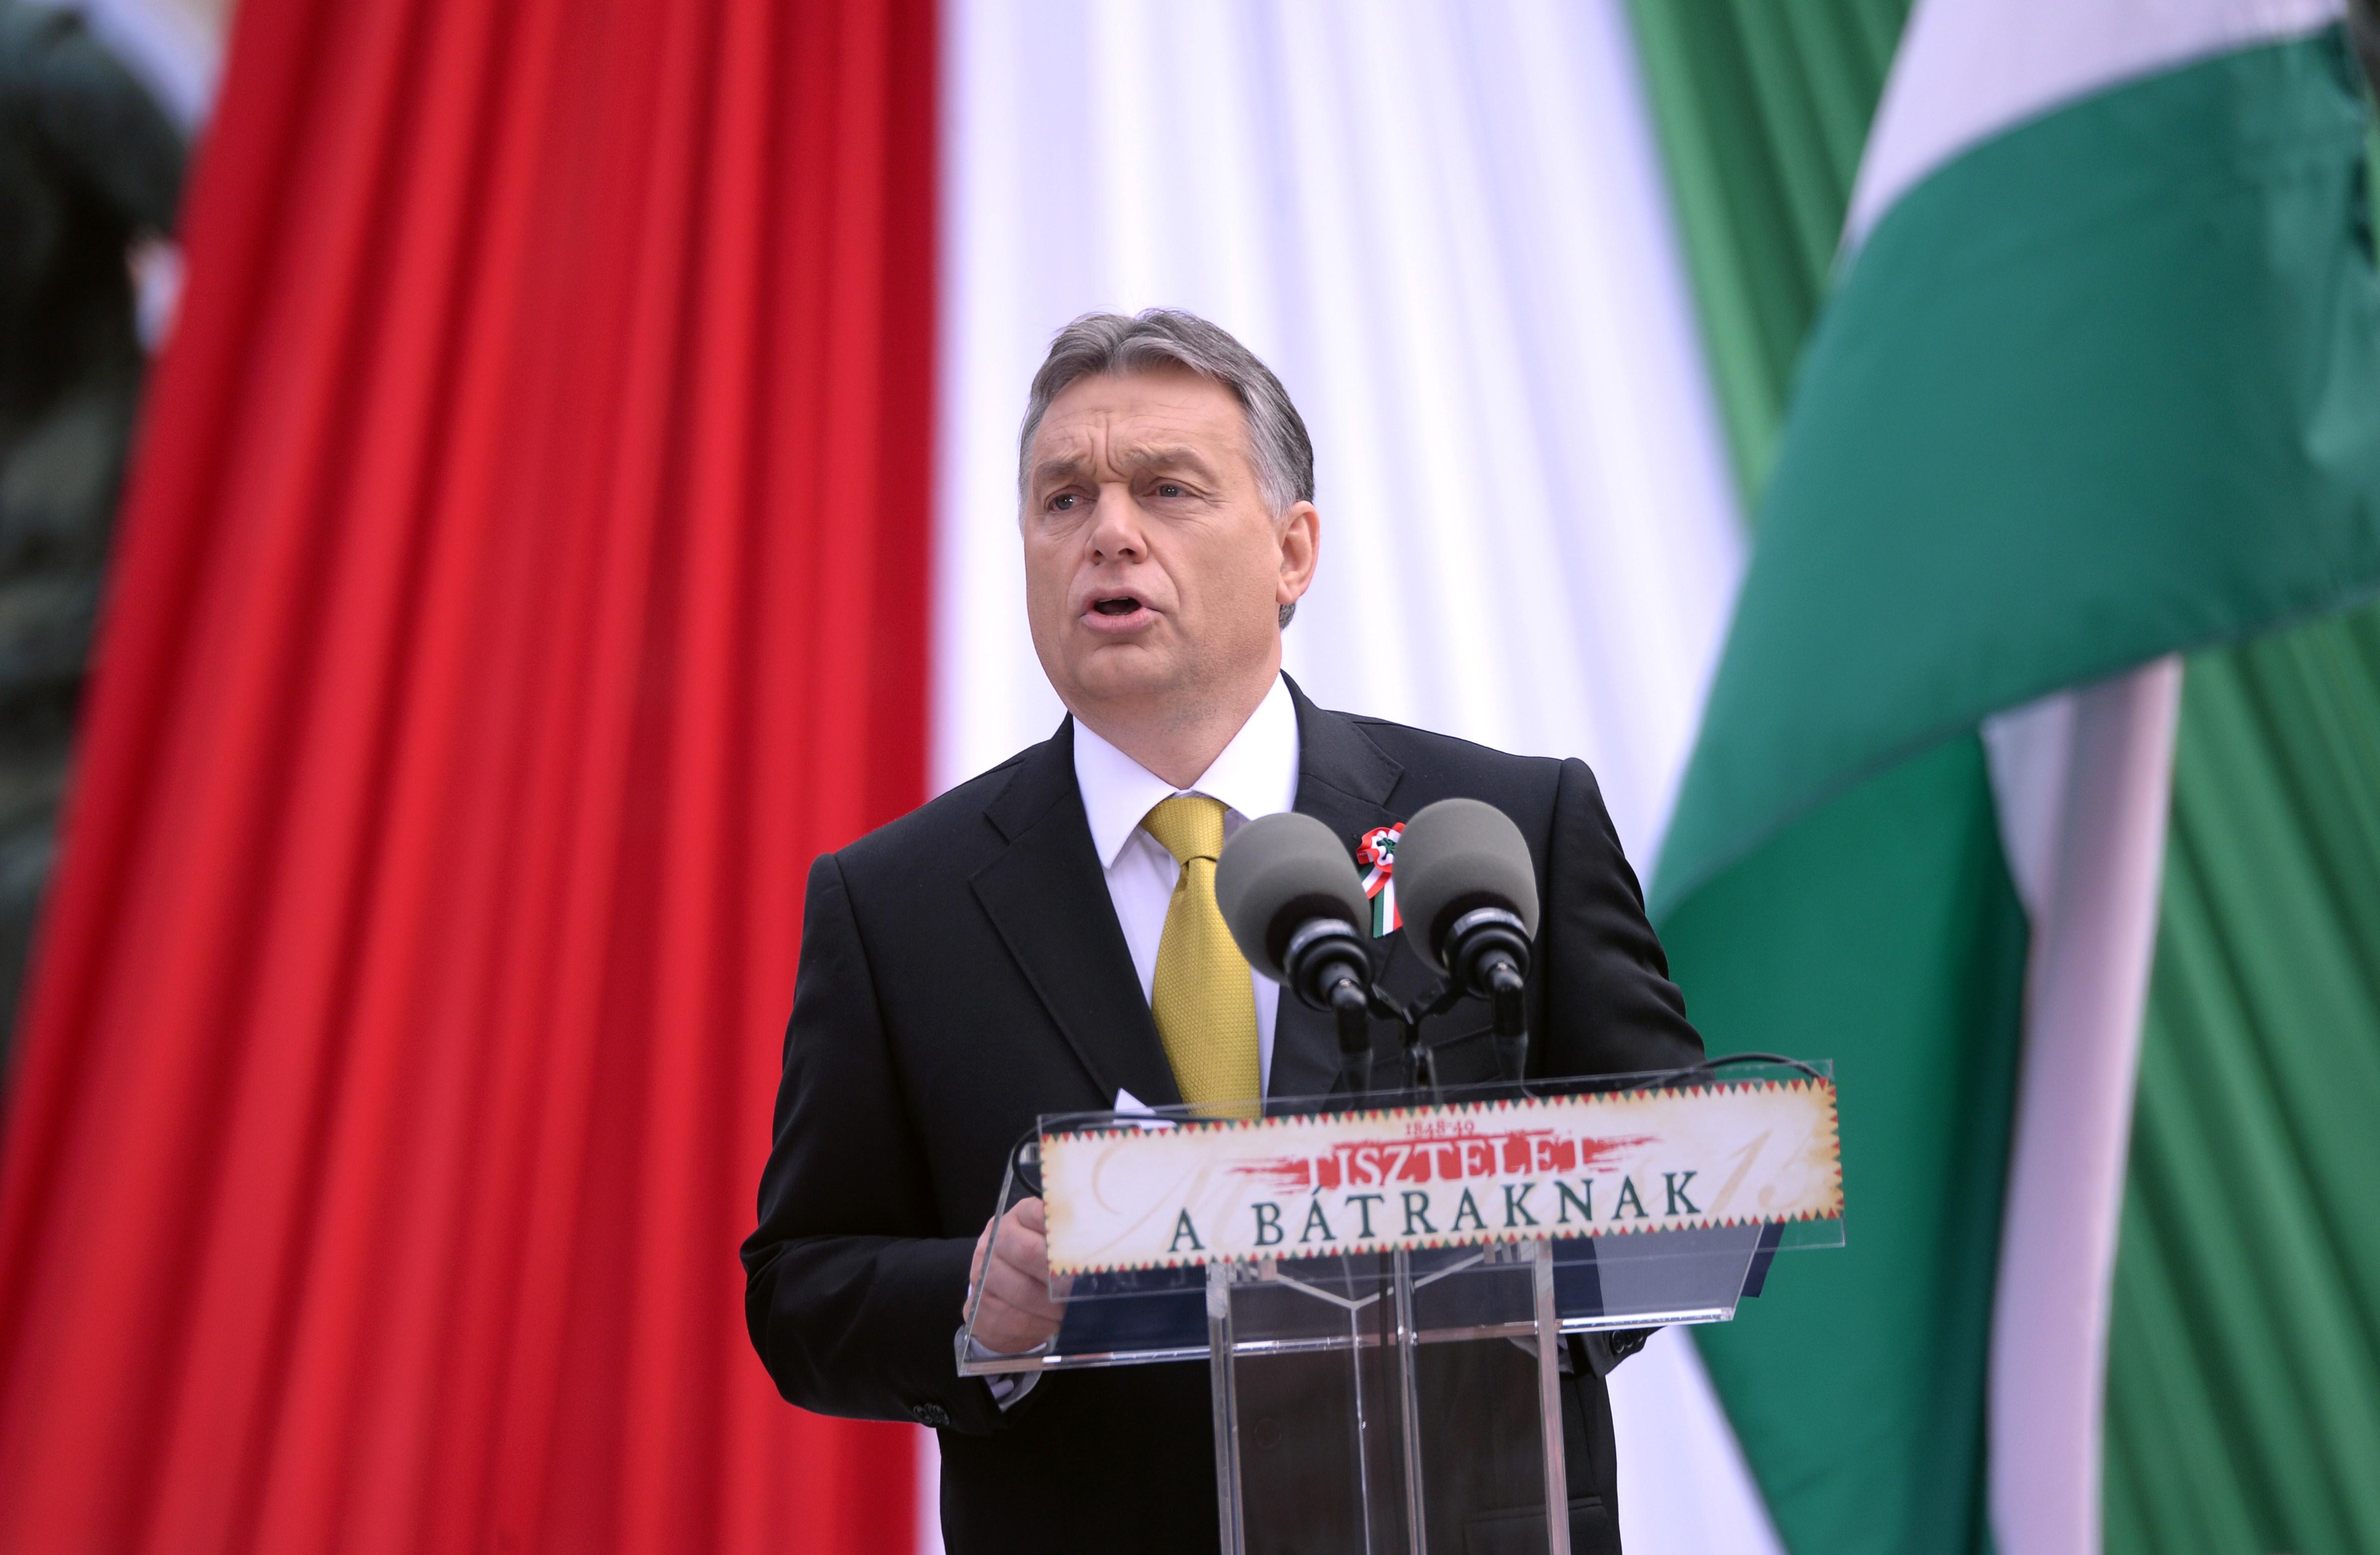 Orban will Referendum über LGBTQ-Gesetz abhalten – Asselborn will Referendum über Ungarns EU-Verbleib